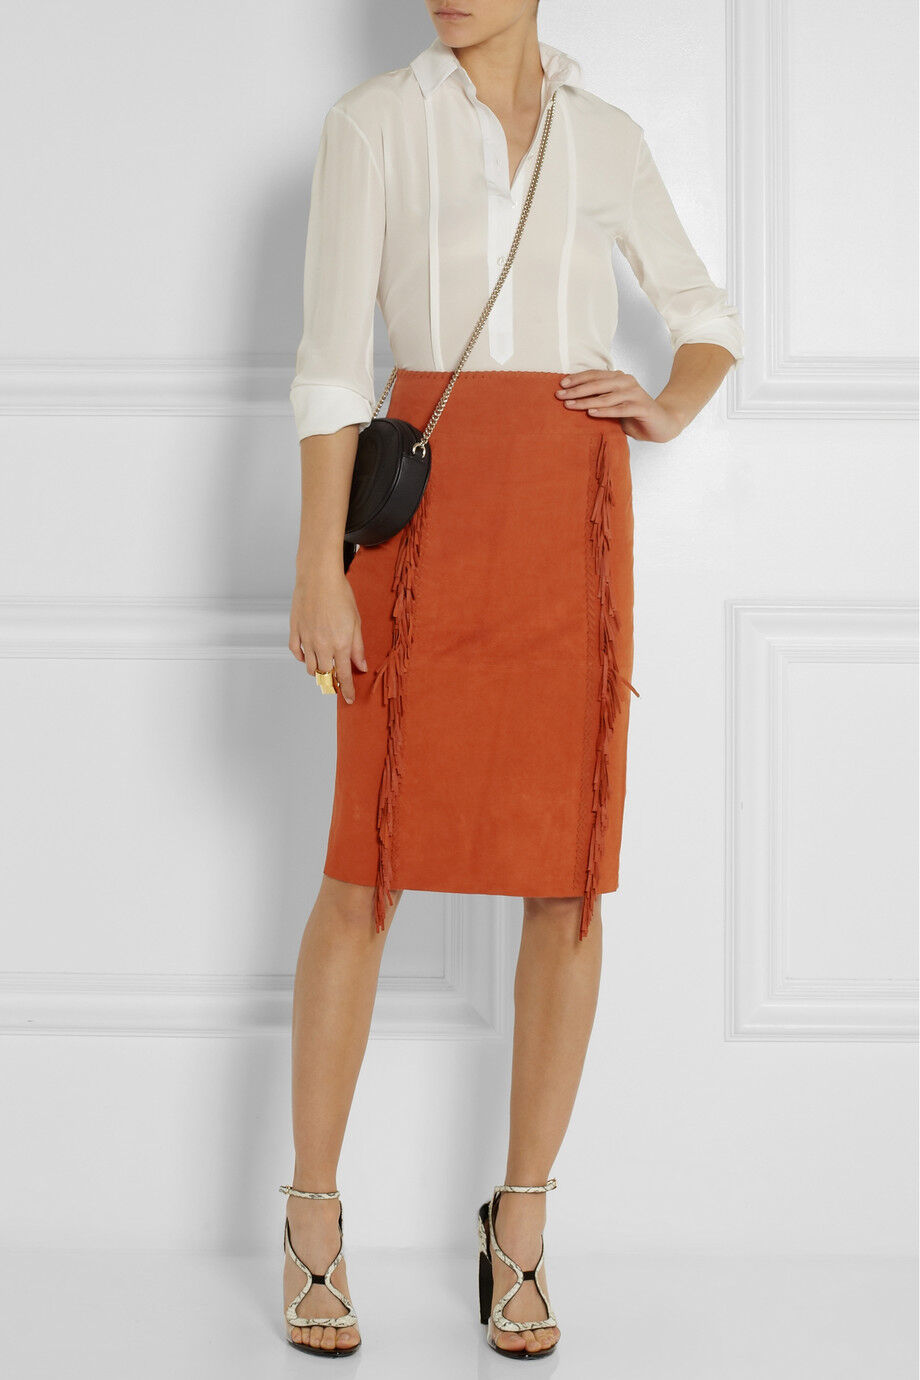 895 NEW Tamara Mellon Fringed Stretchy SUEDE Pencil Skirt Burnt Orange Fringe 2